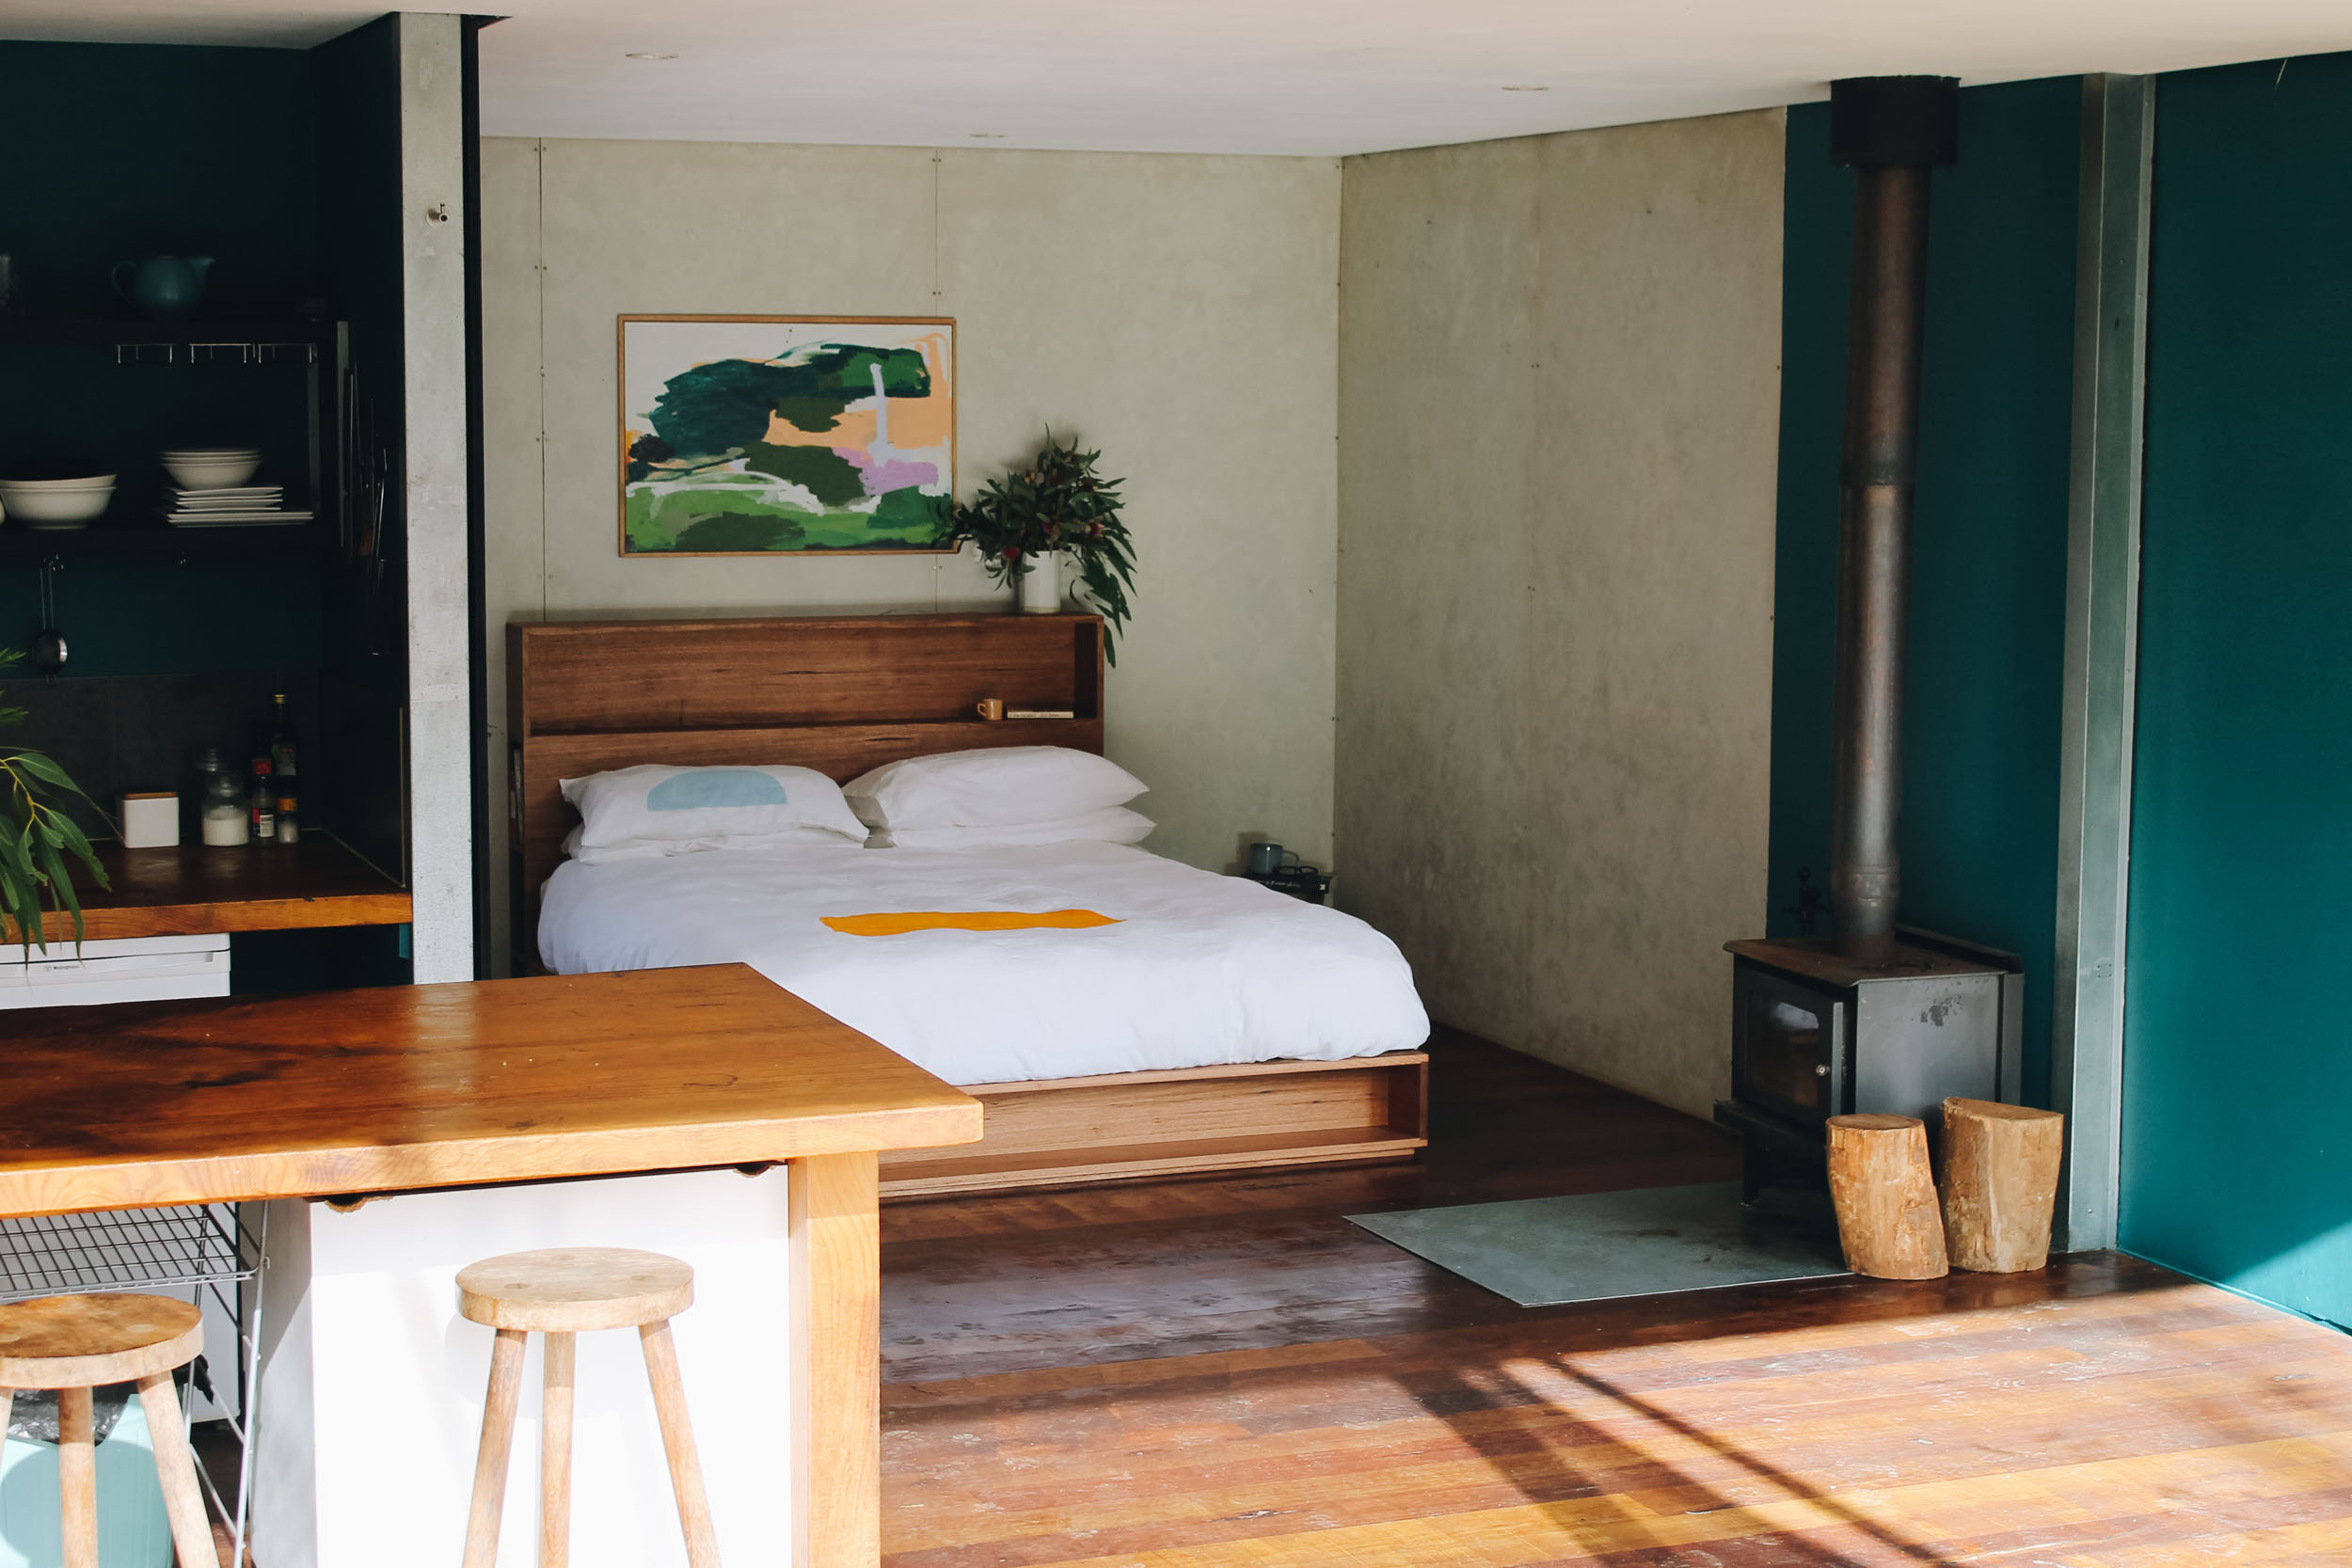 Al and Imo Handmade Bookshelf Drawer Bed Recycled timber - surf coast - melbourne - australia-23.jpg